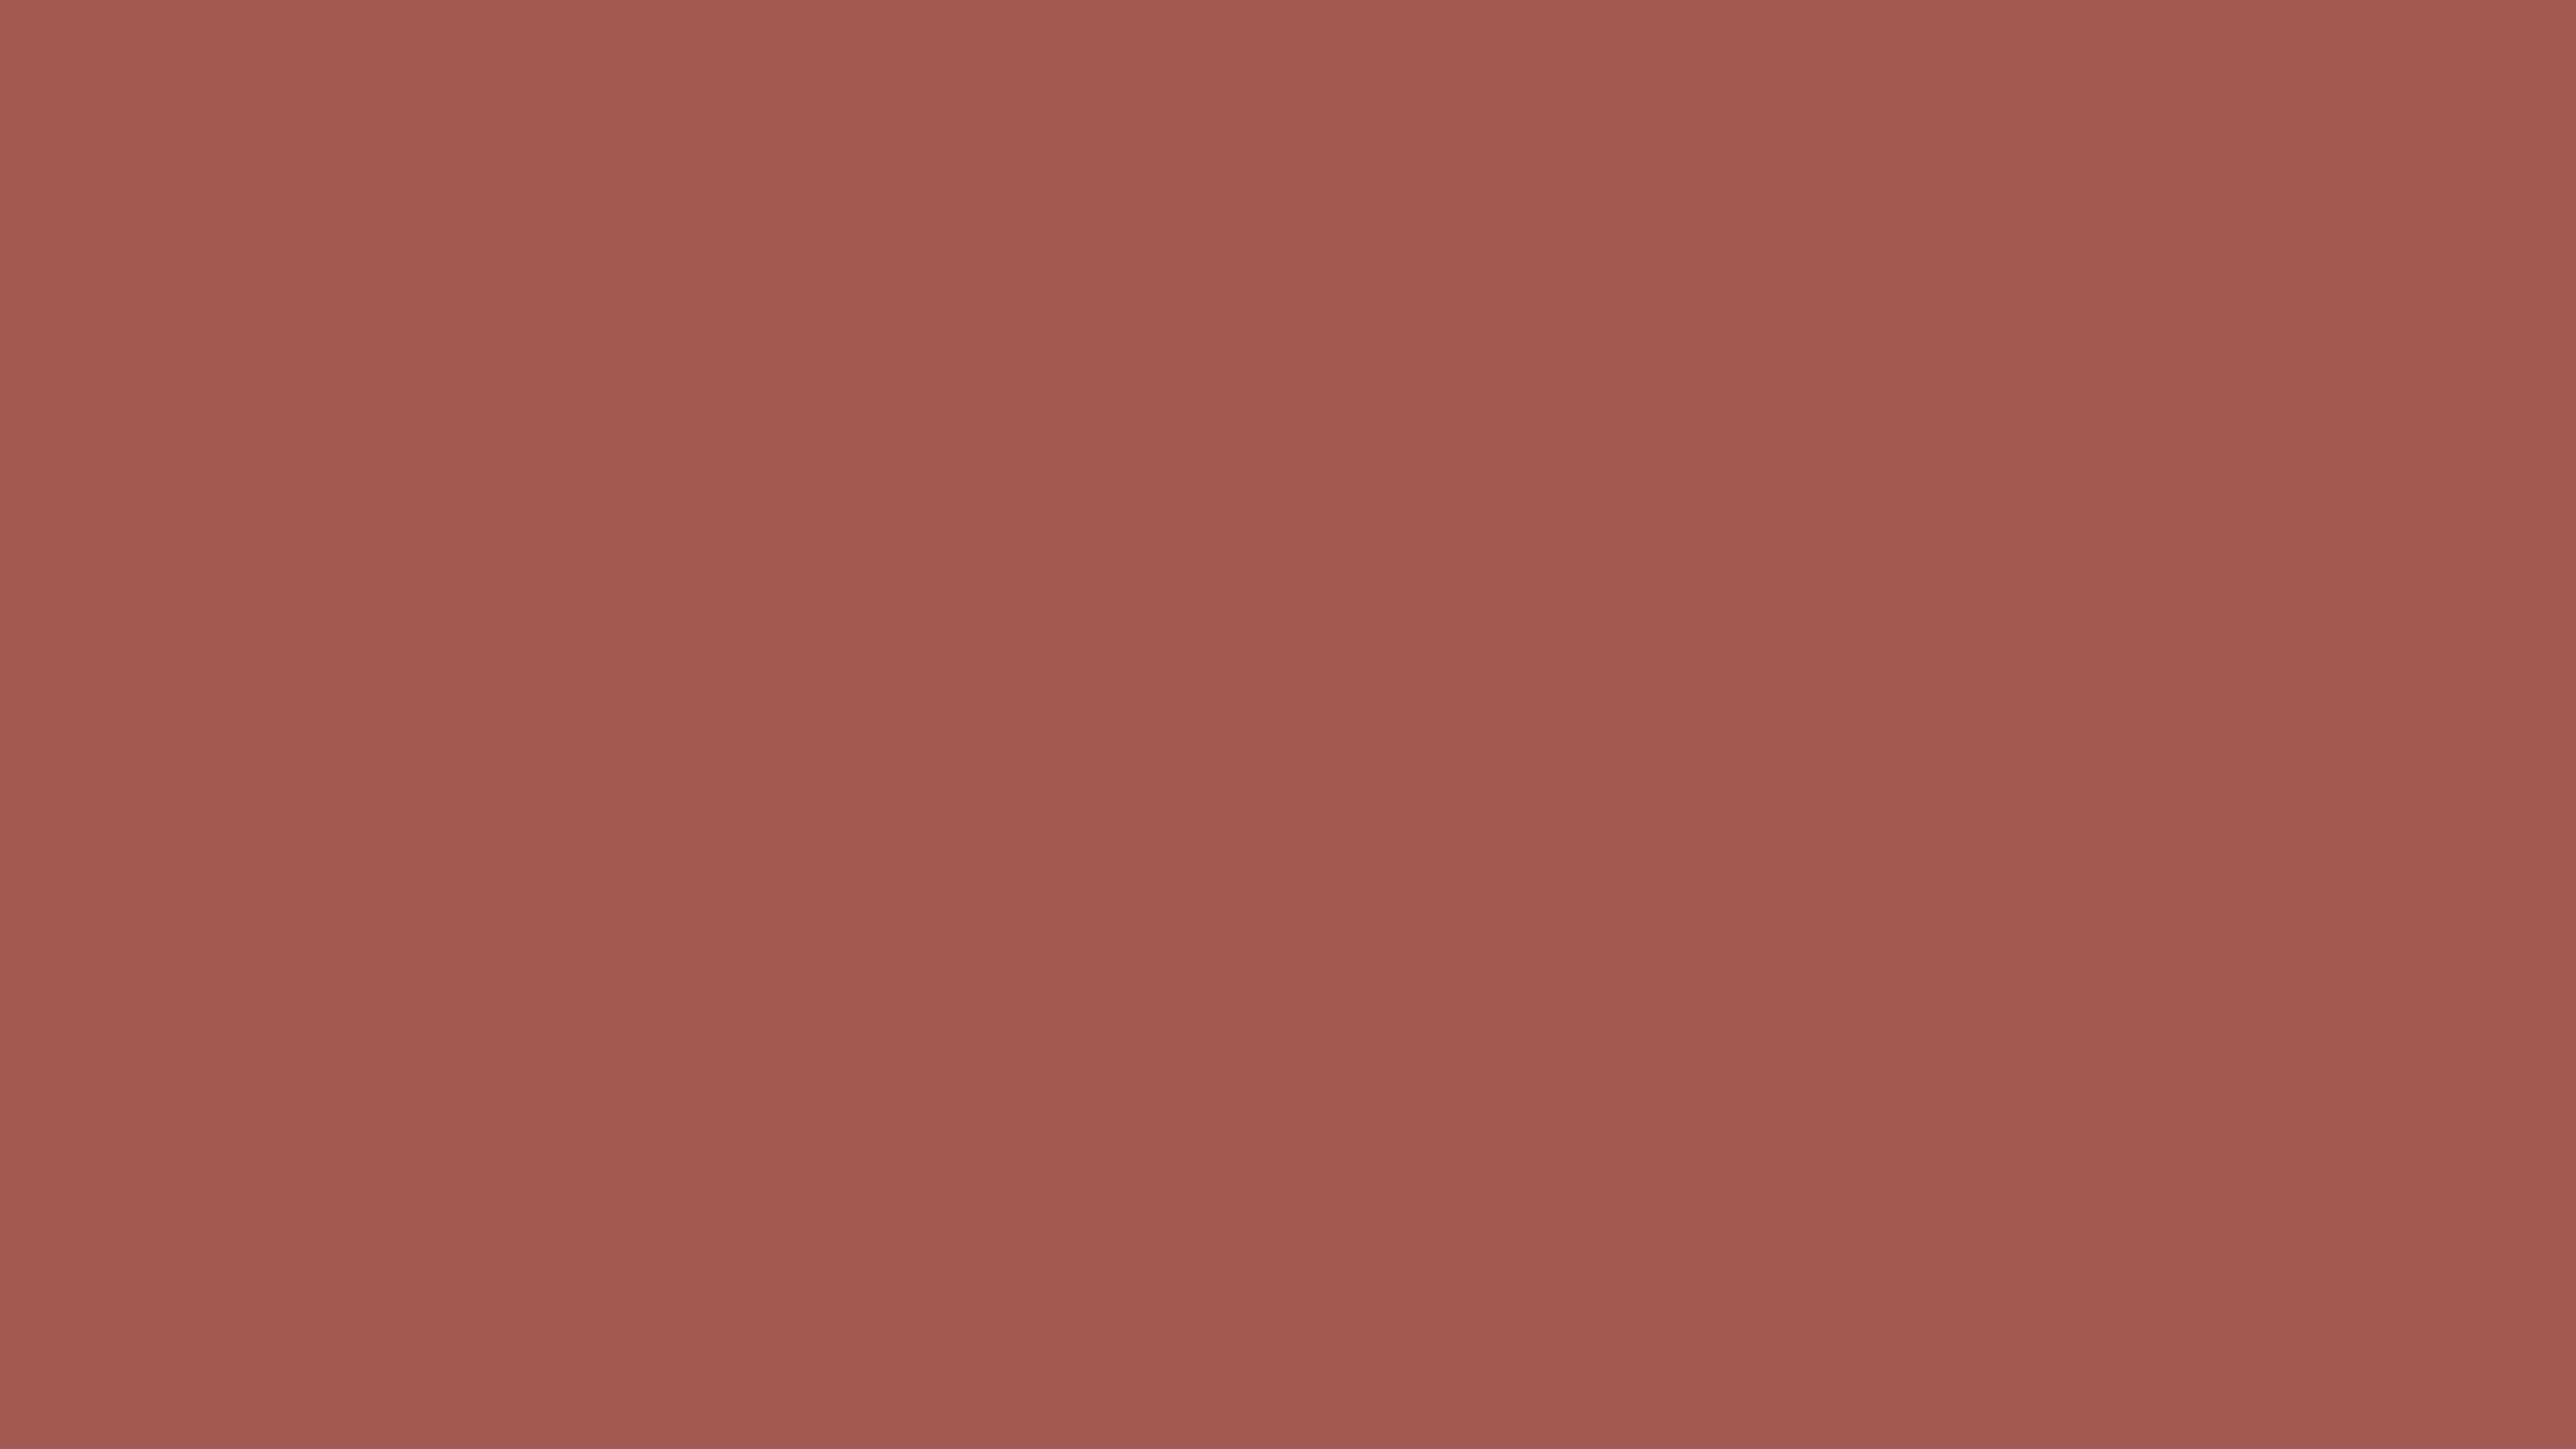 4096x2304 Redwood Solid Color Background